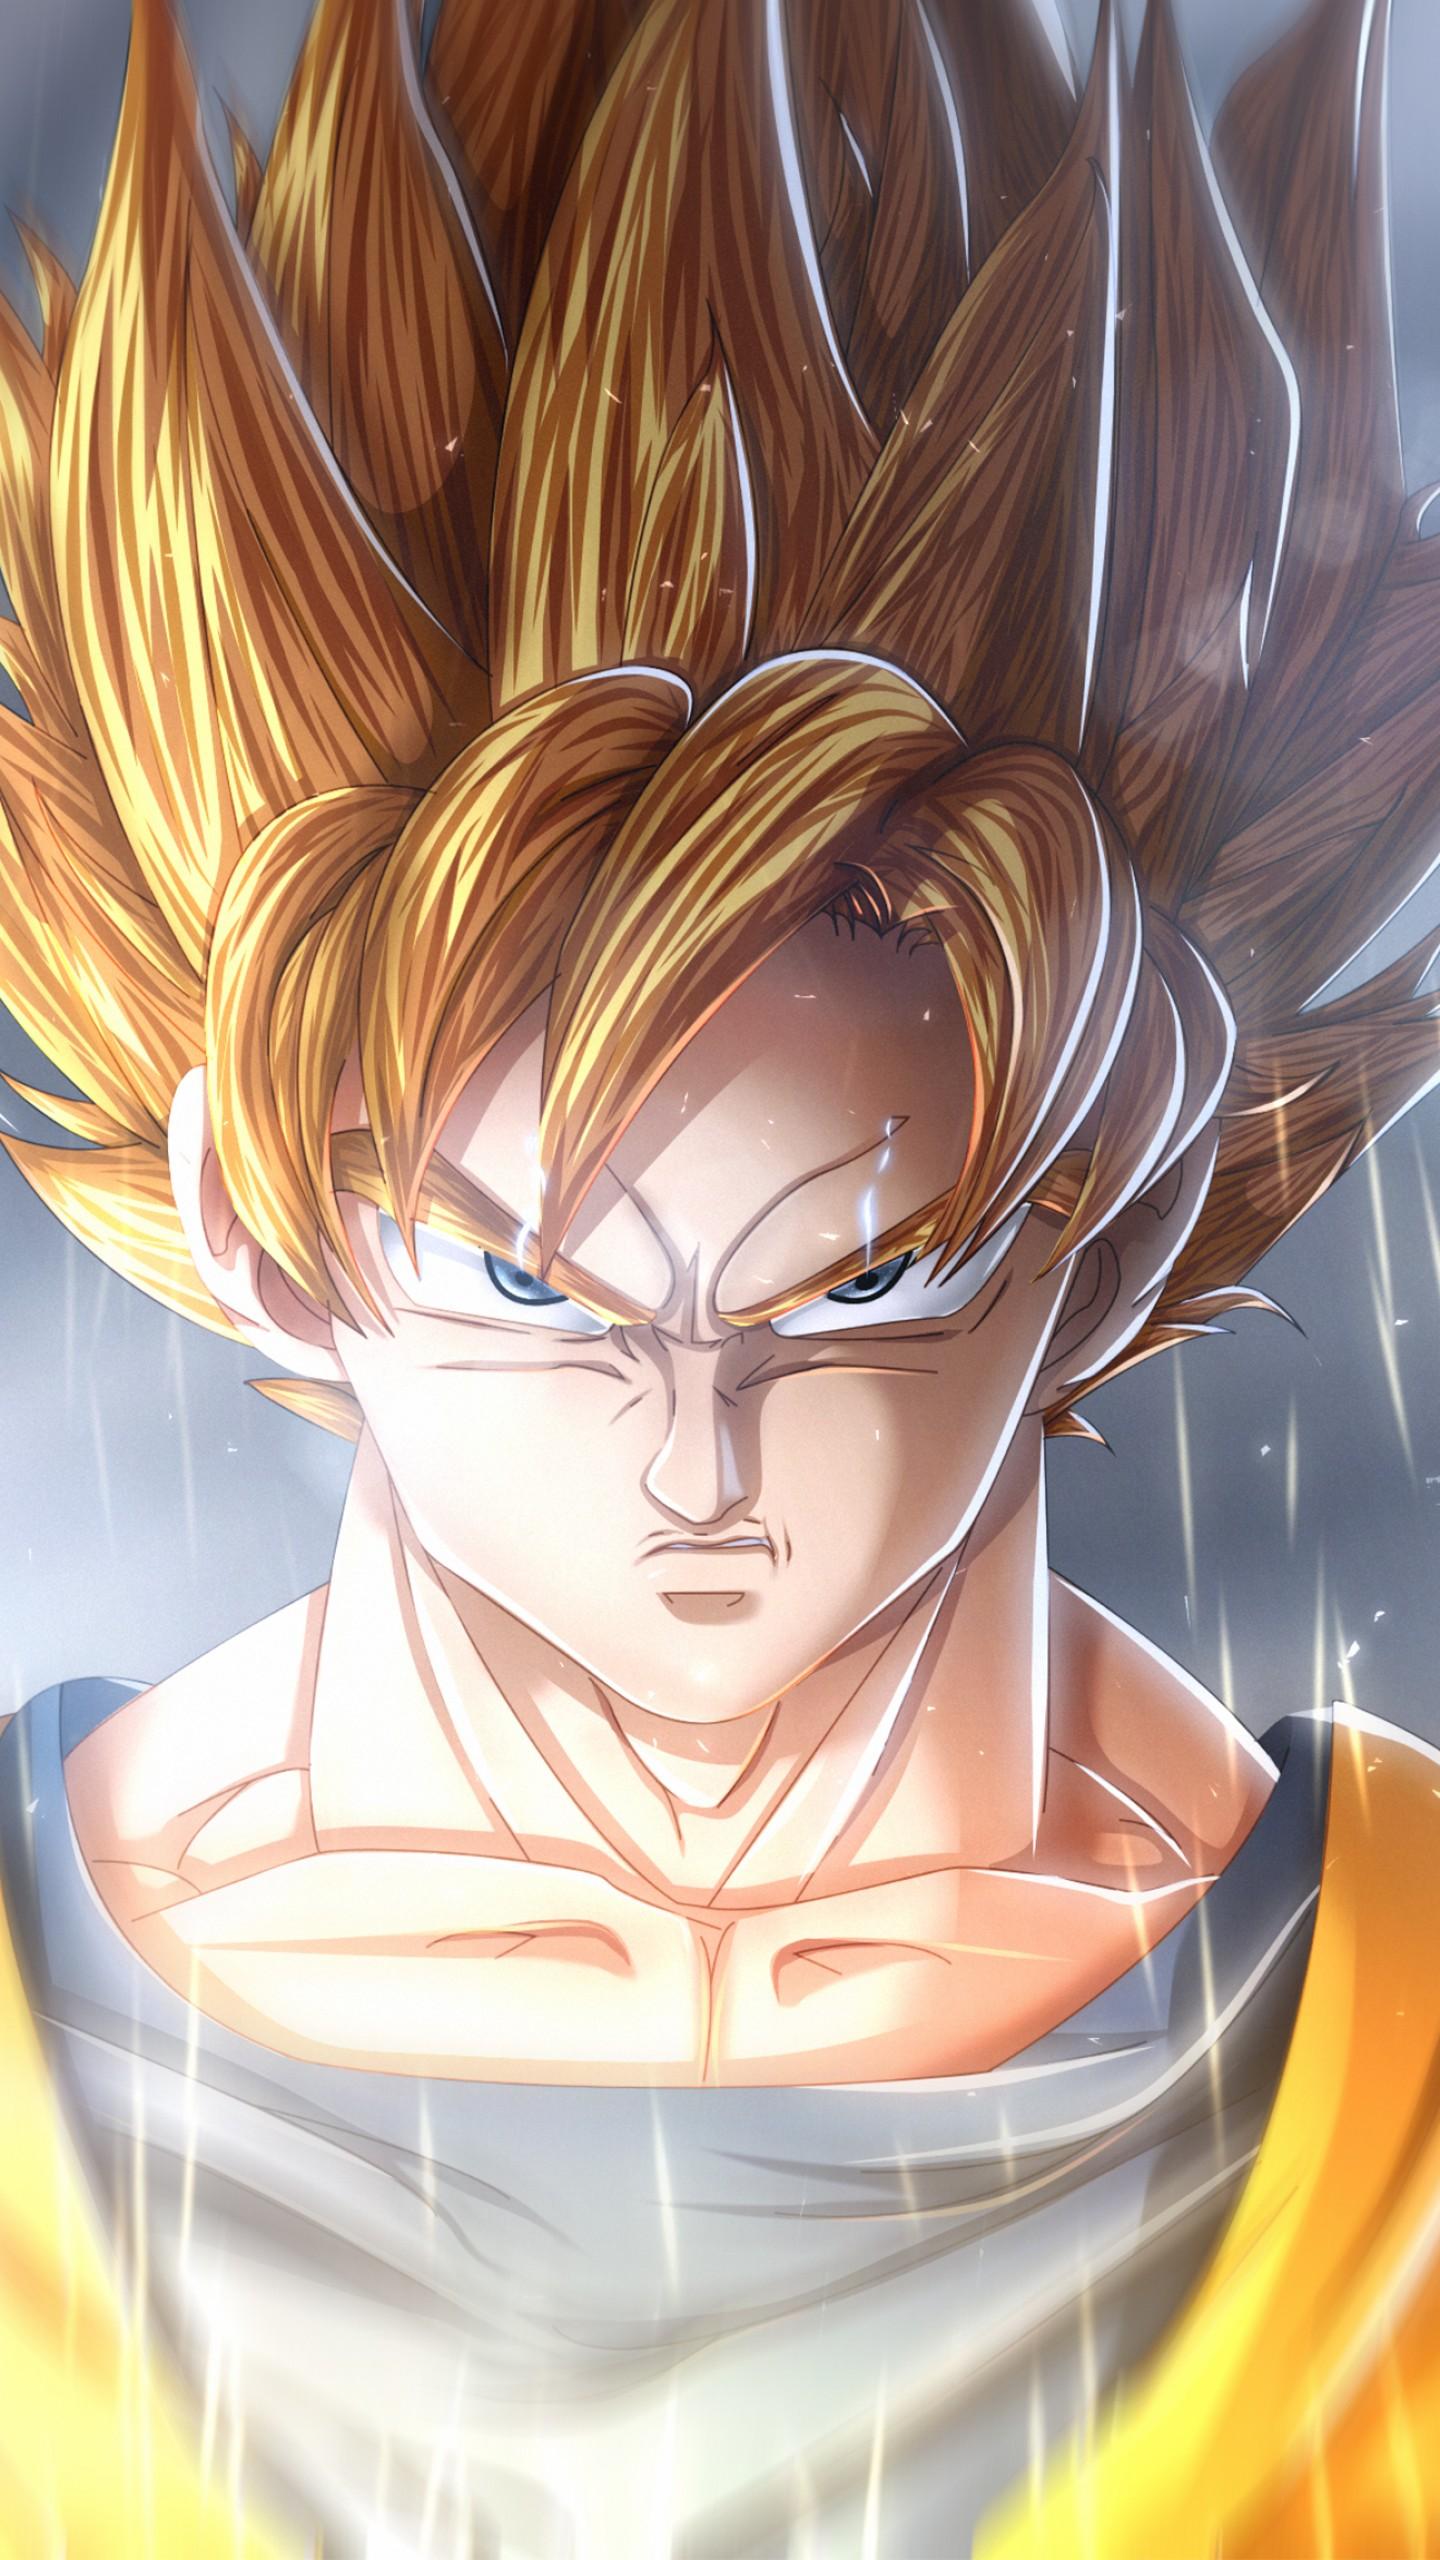 Super Saiyan Goku 2986081 Hd Wallpaper Backgrounds Download